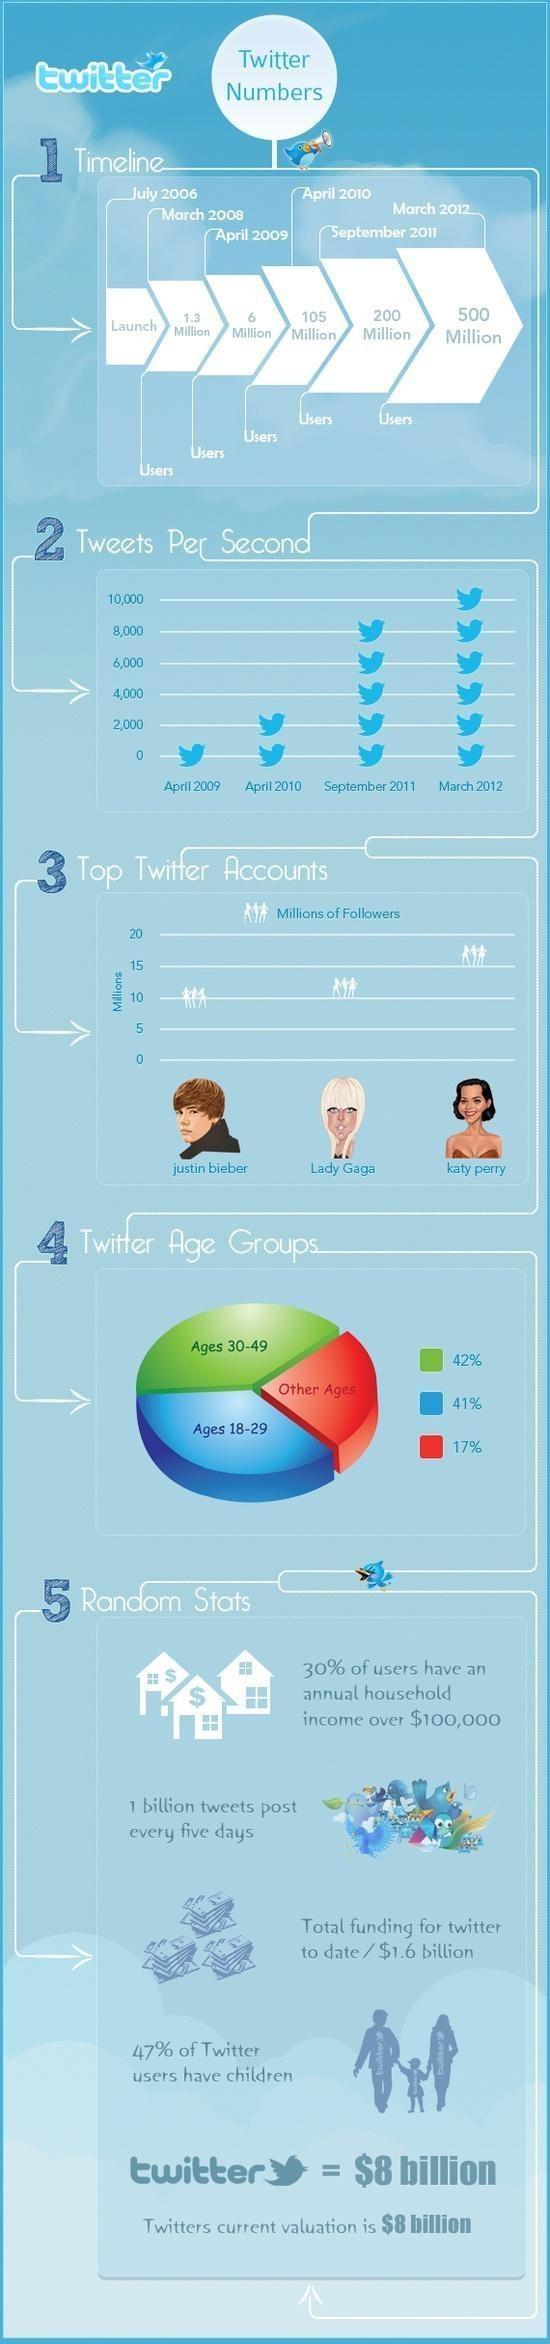 Twitter Numbers #FormaciónEbusiness #Infografia cc: @Linda Bruinenberg Bruinenberg Whitley Managers Latam